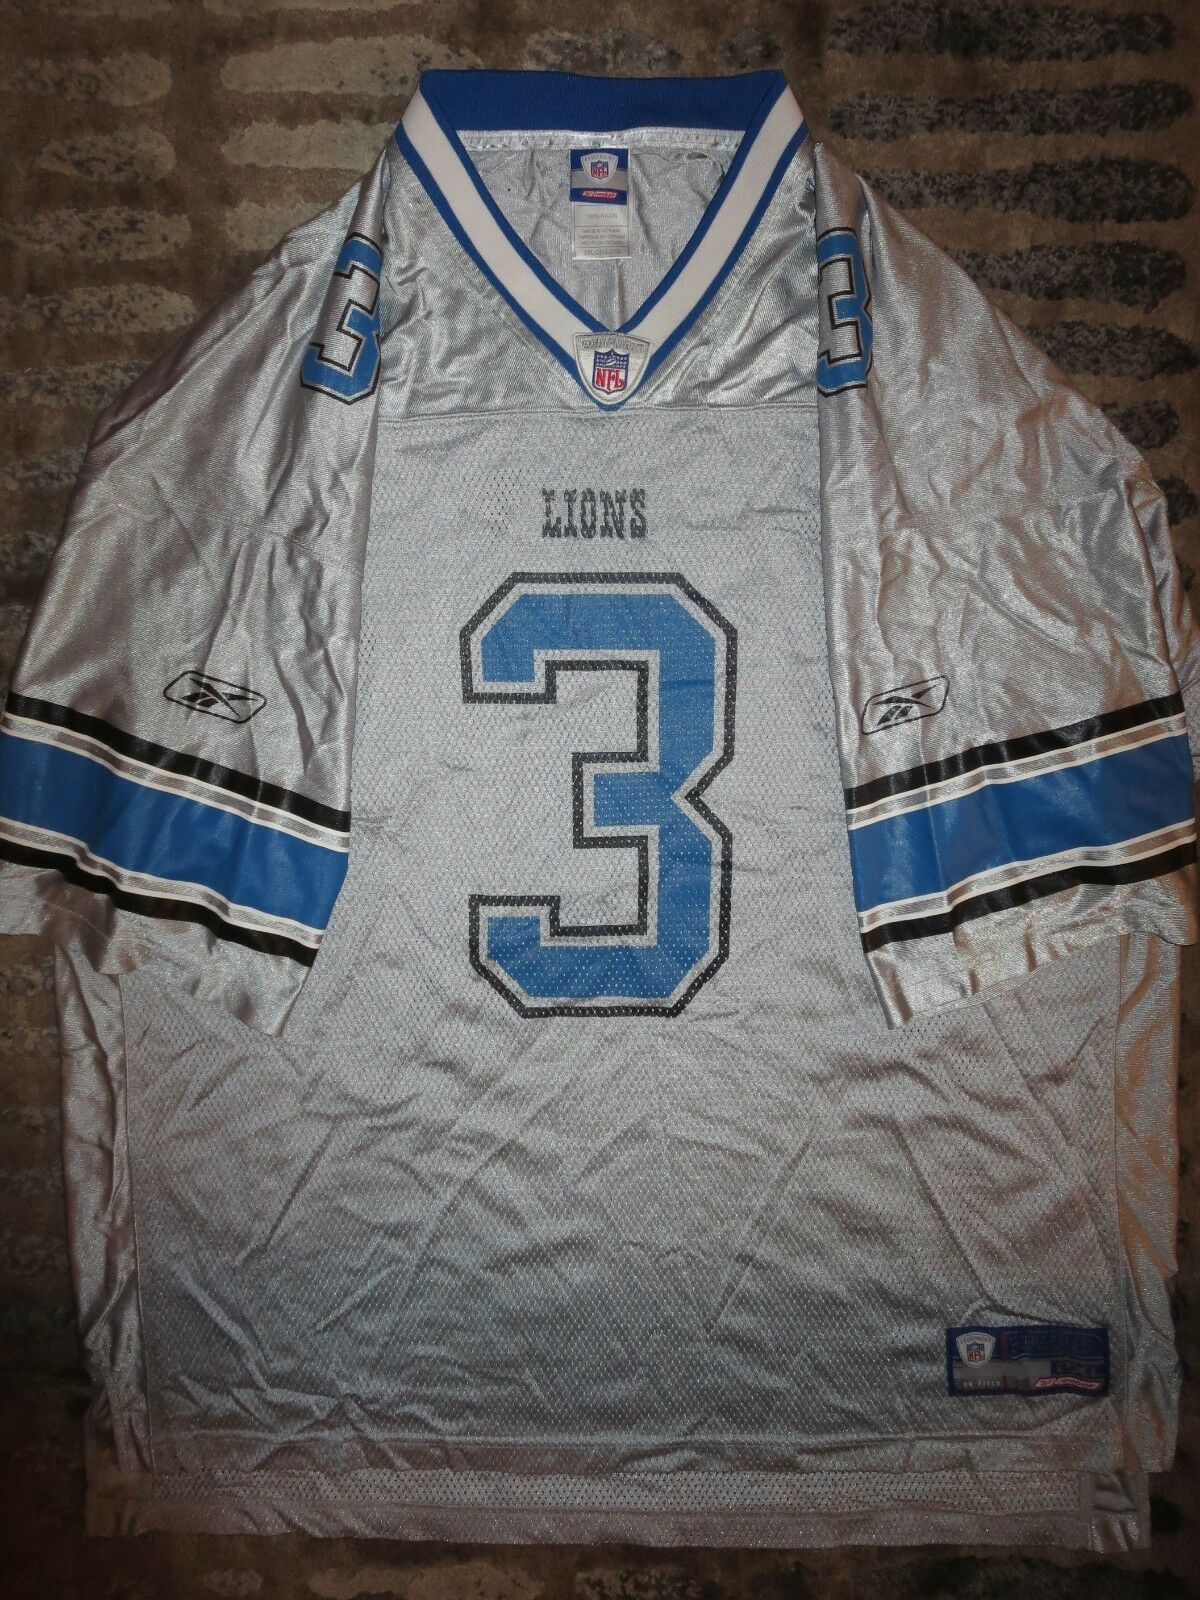 Detroit Lions Lions Lions  3 Joey Harrington NFL Silber Edition Reebok Trikot 2XL ec1cc1